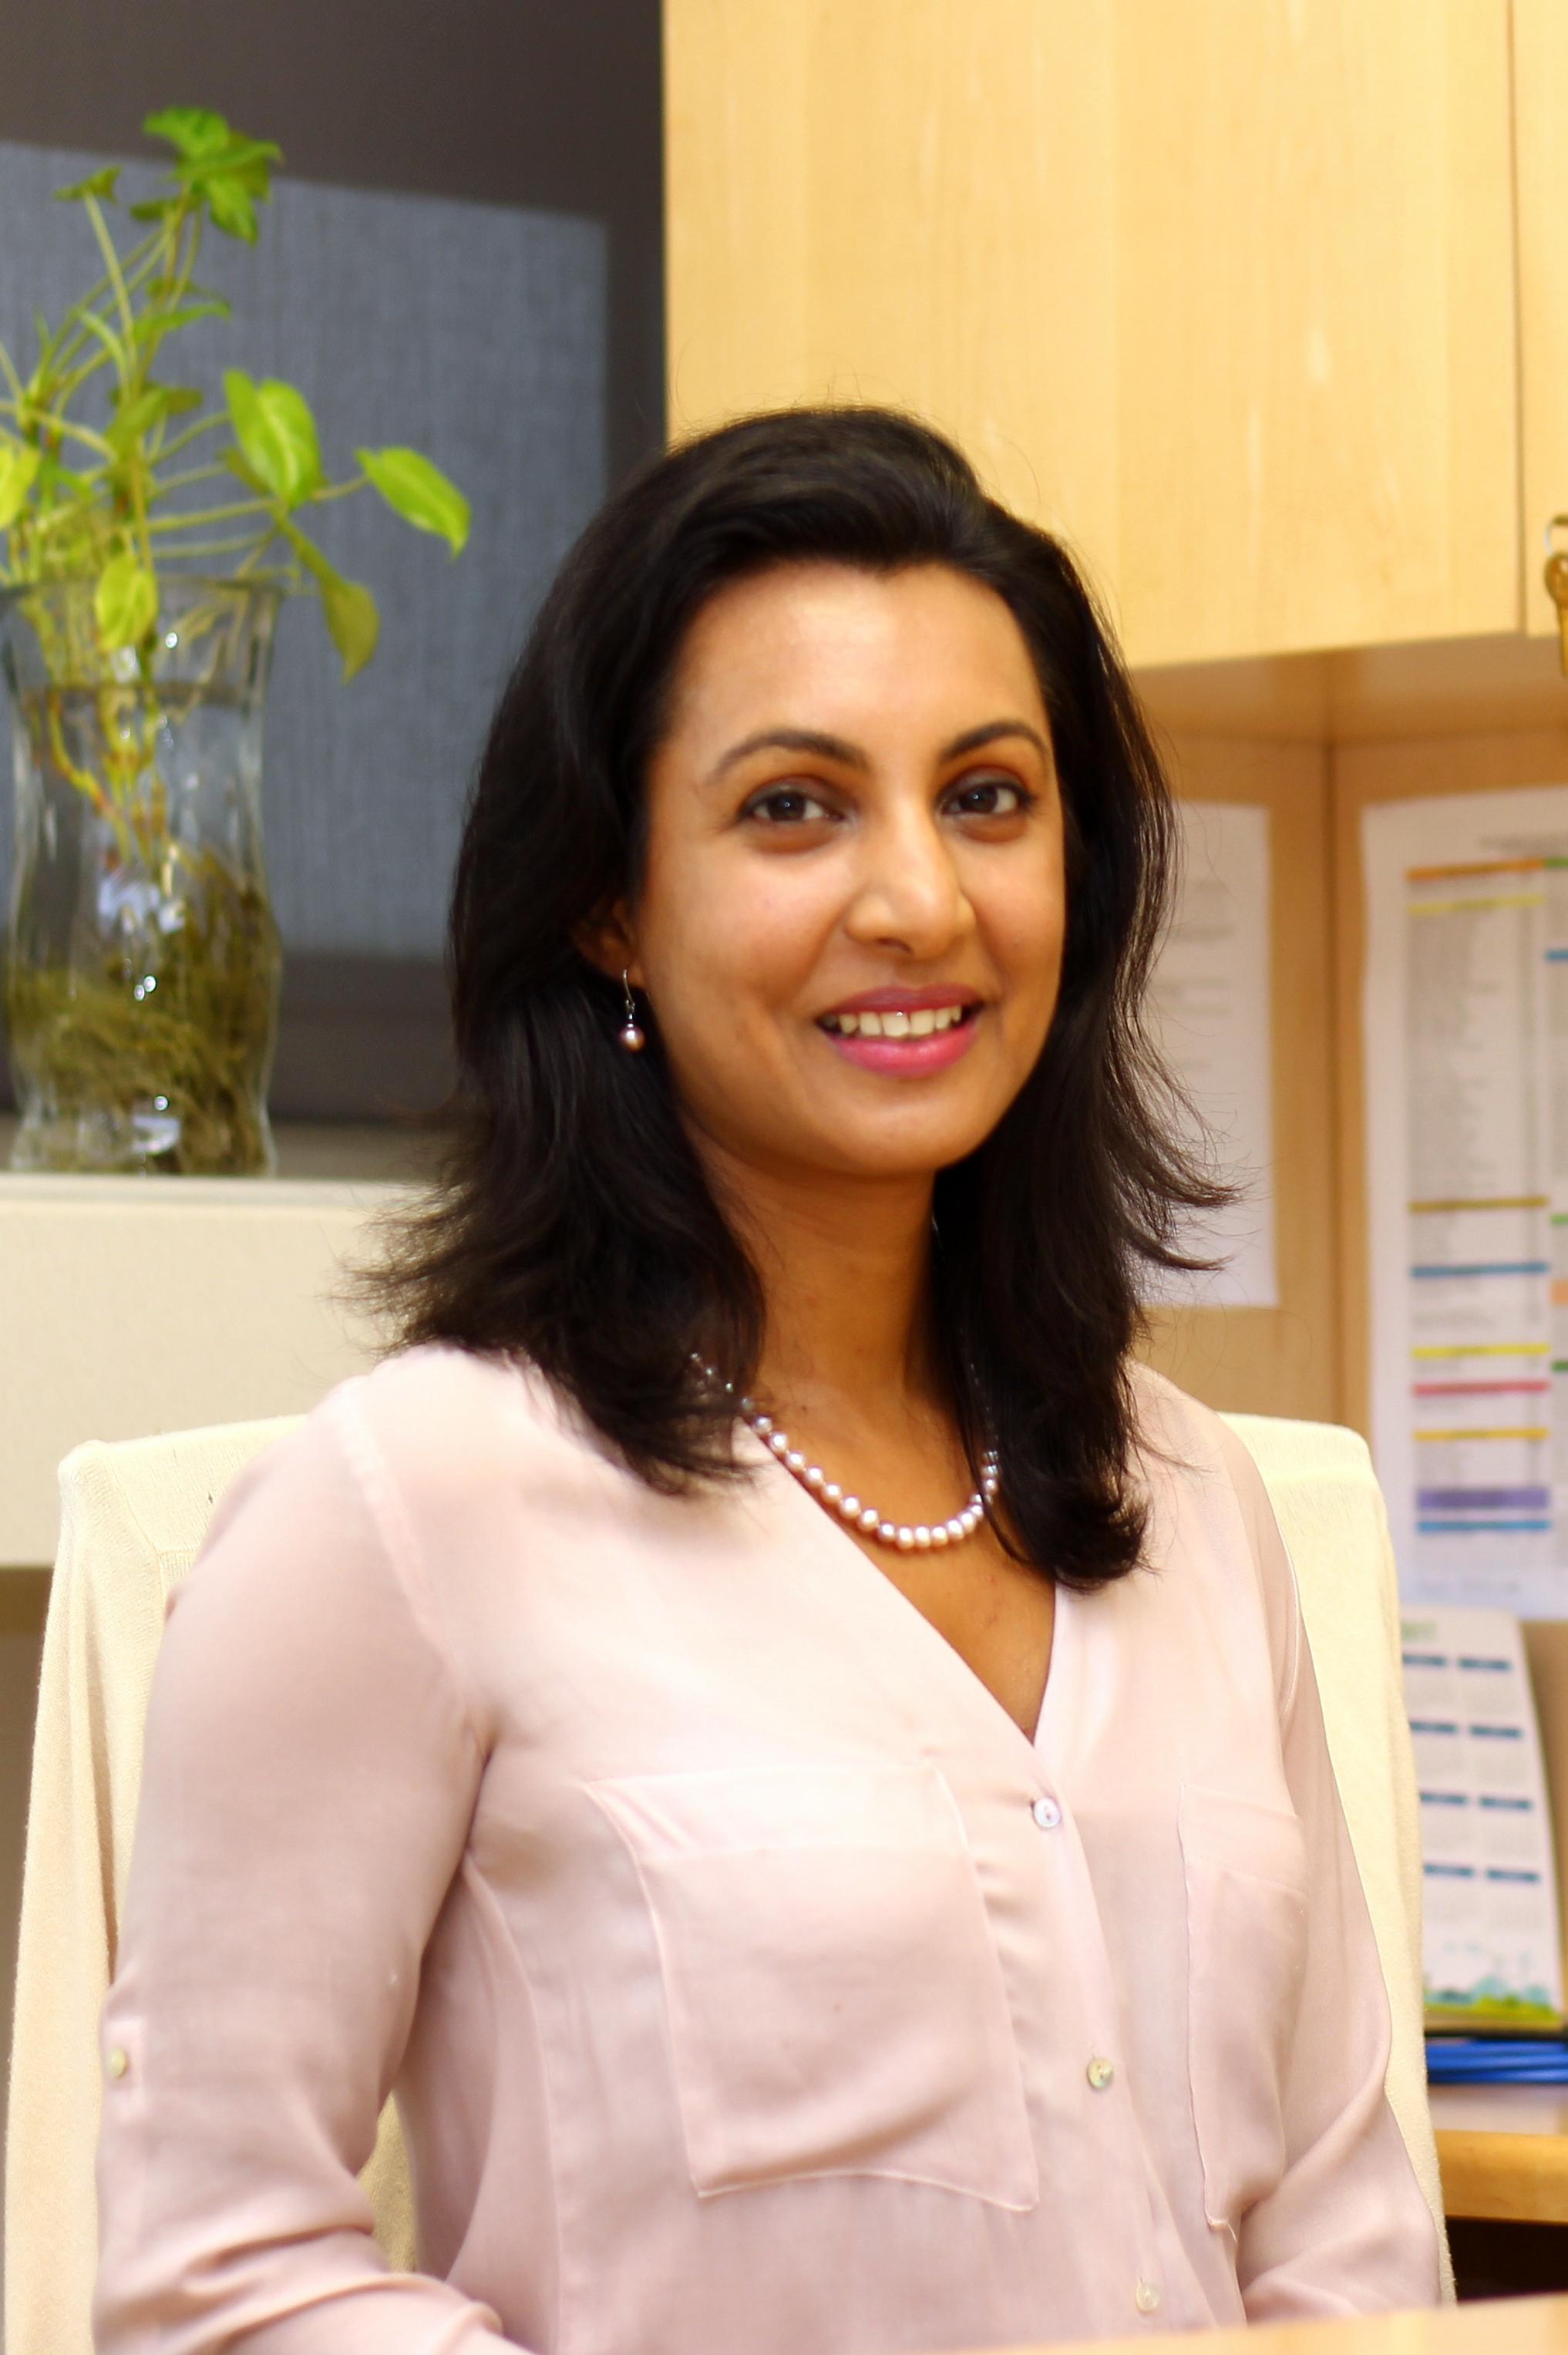 Brenna Garcia (b. 2004),Vishka Asayesh Adult pics & movies Neetu Chandra,Sonia Balani 2012